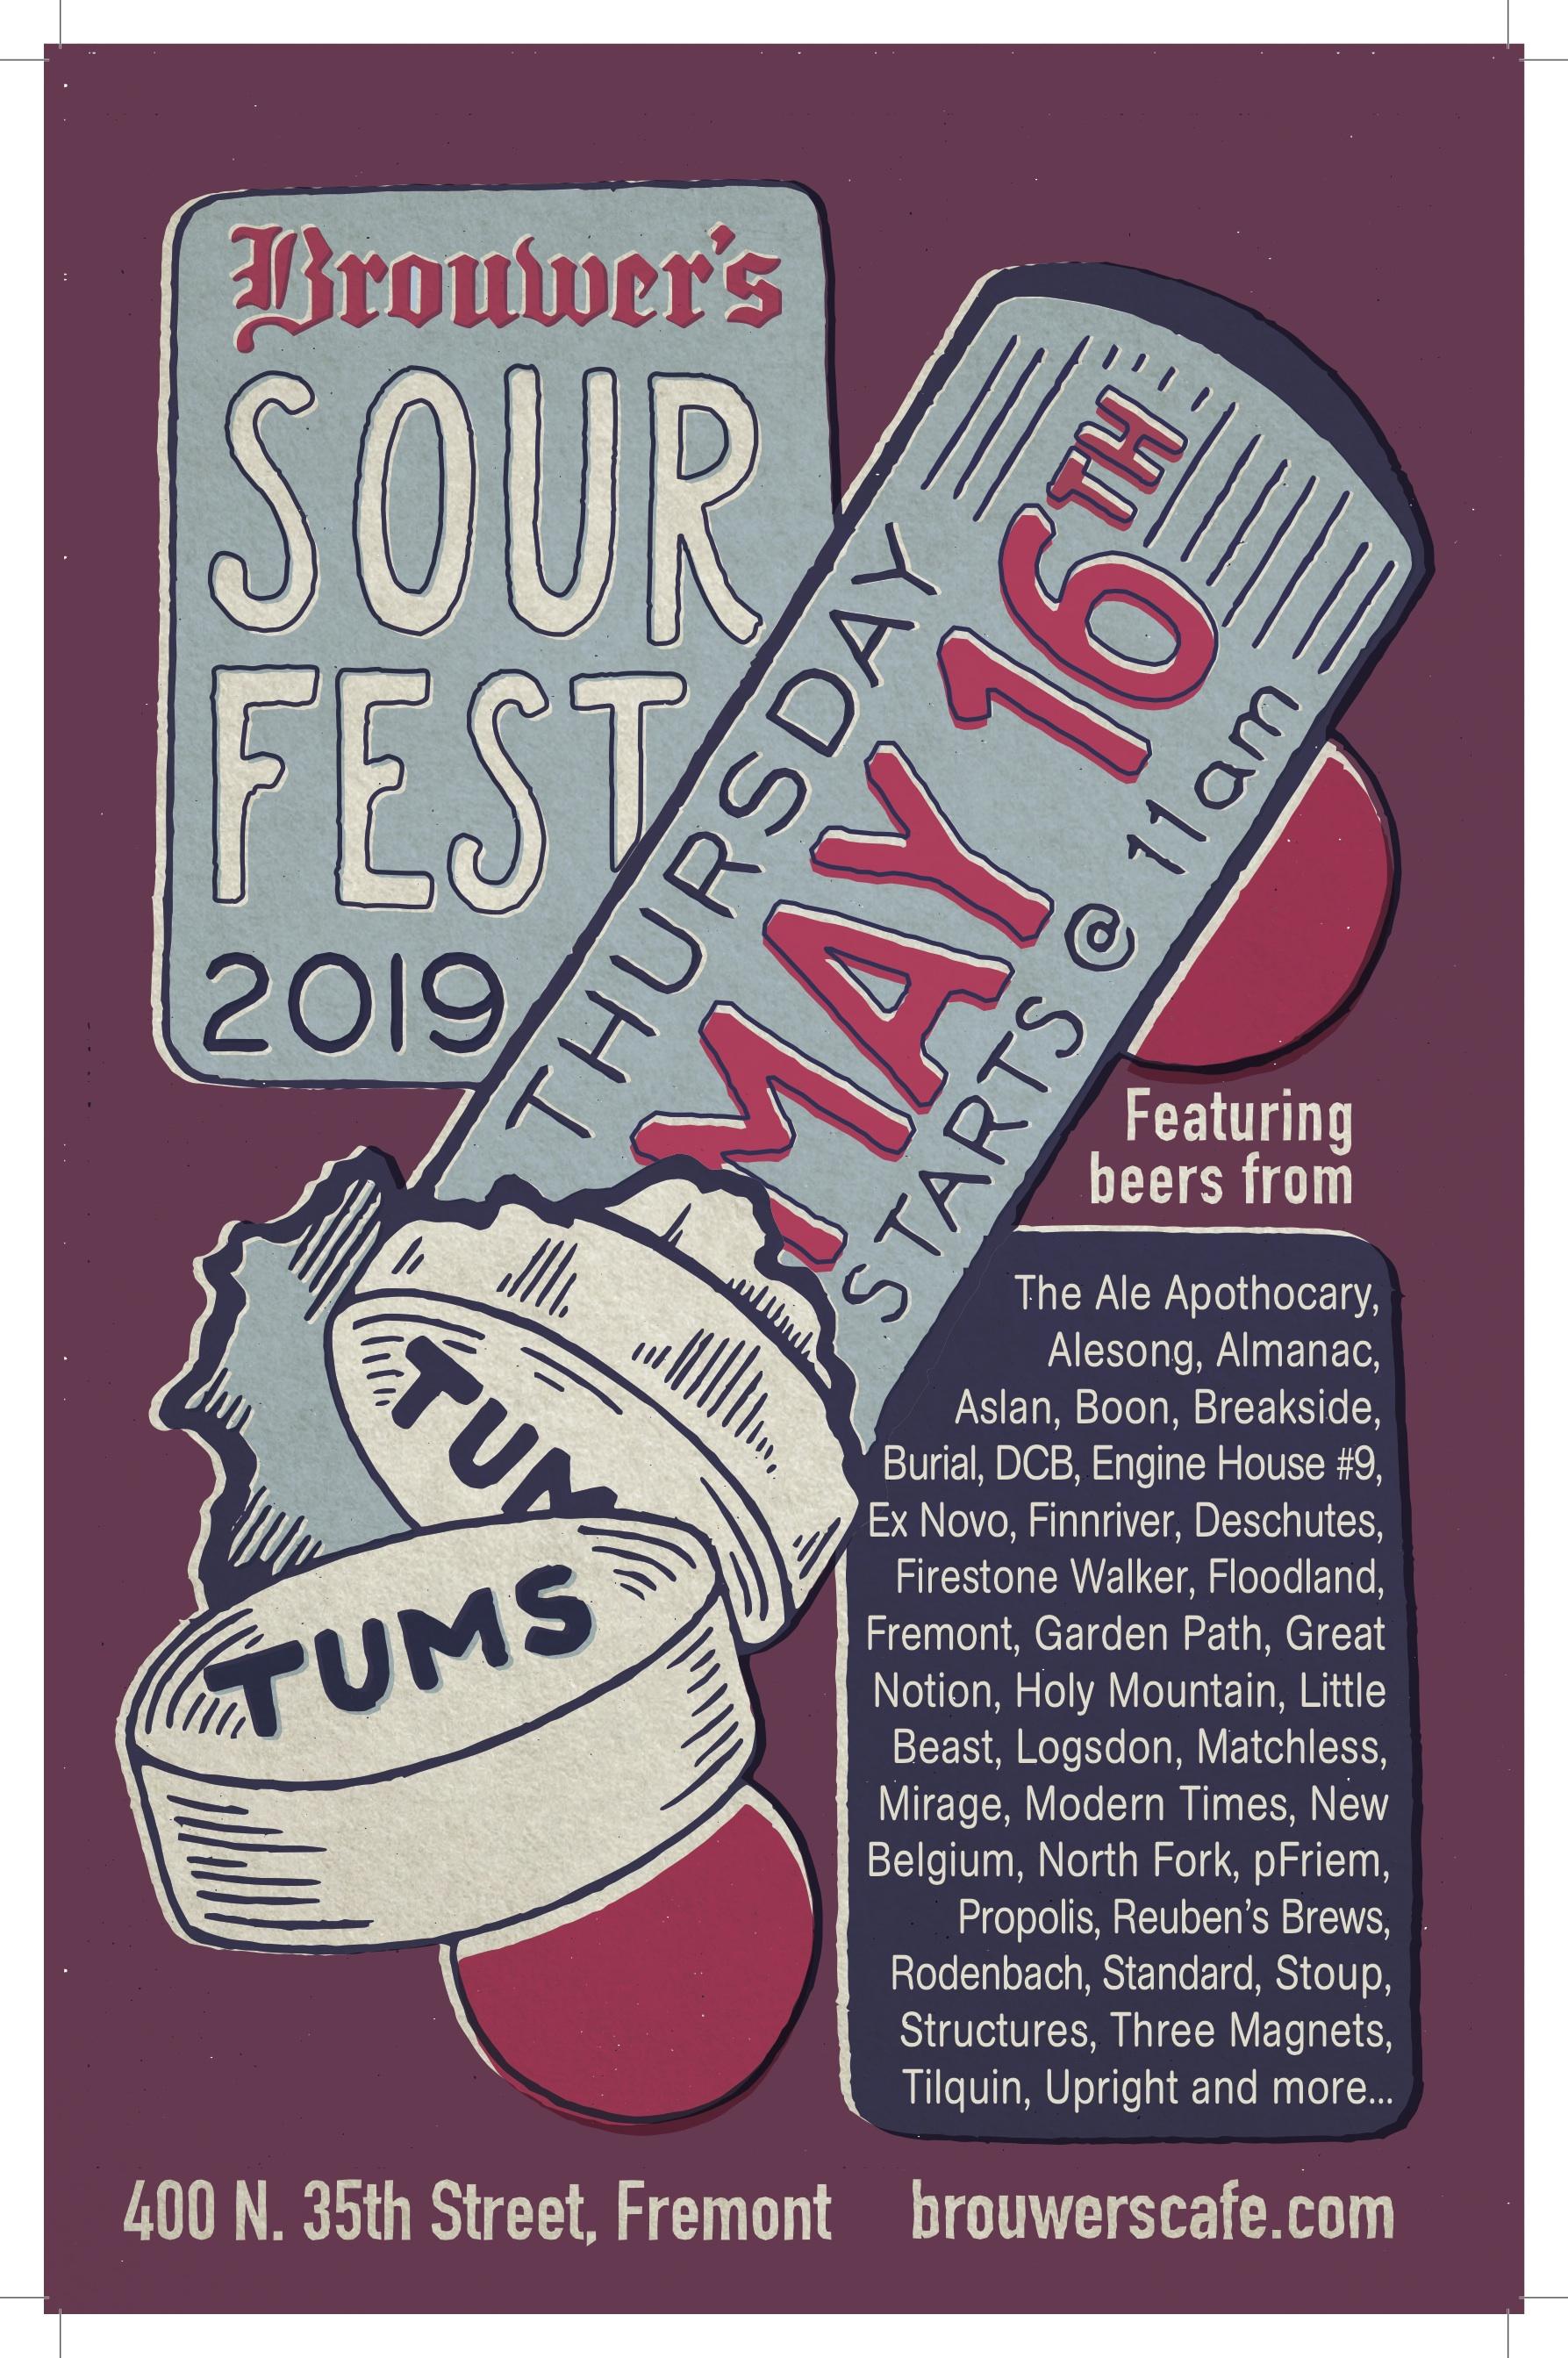 Thursday, May 16th @ 11am, Sour Fest